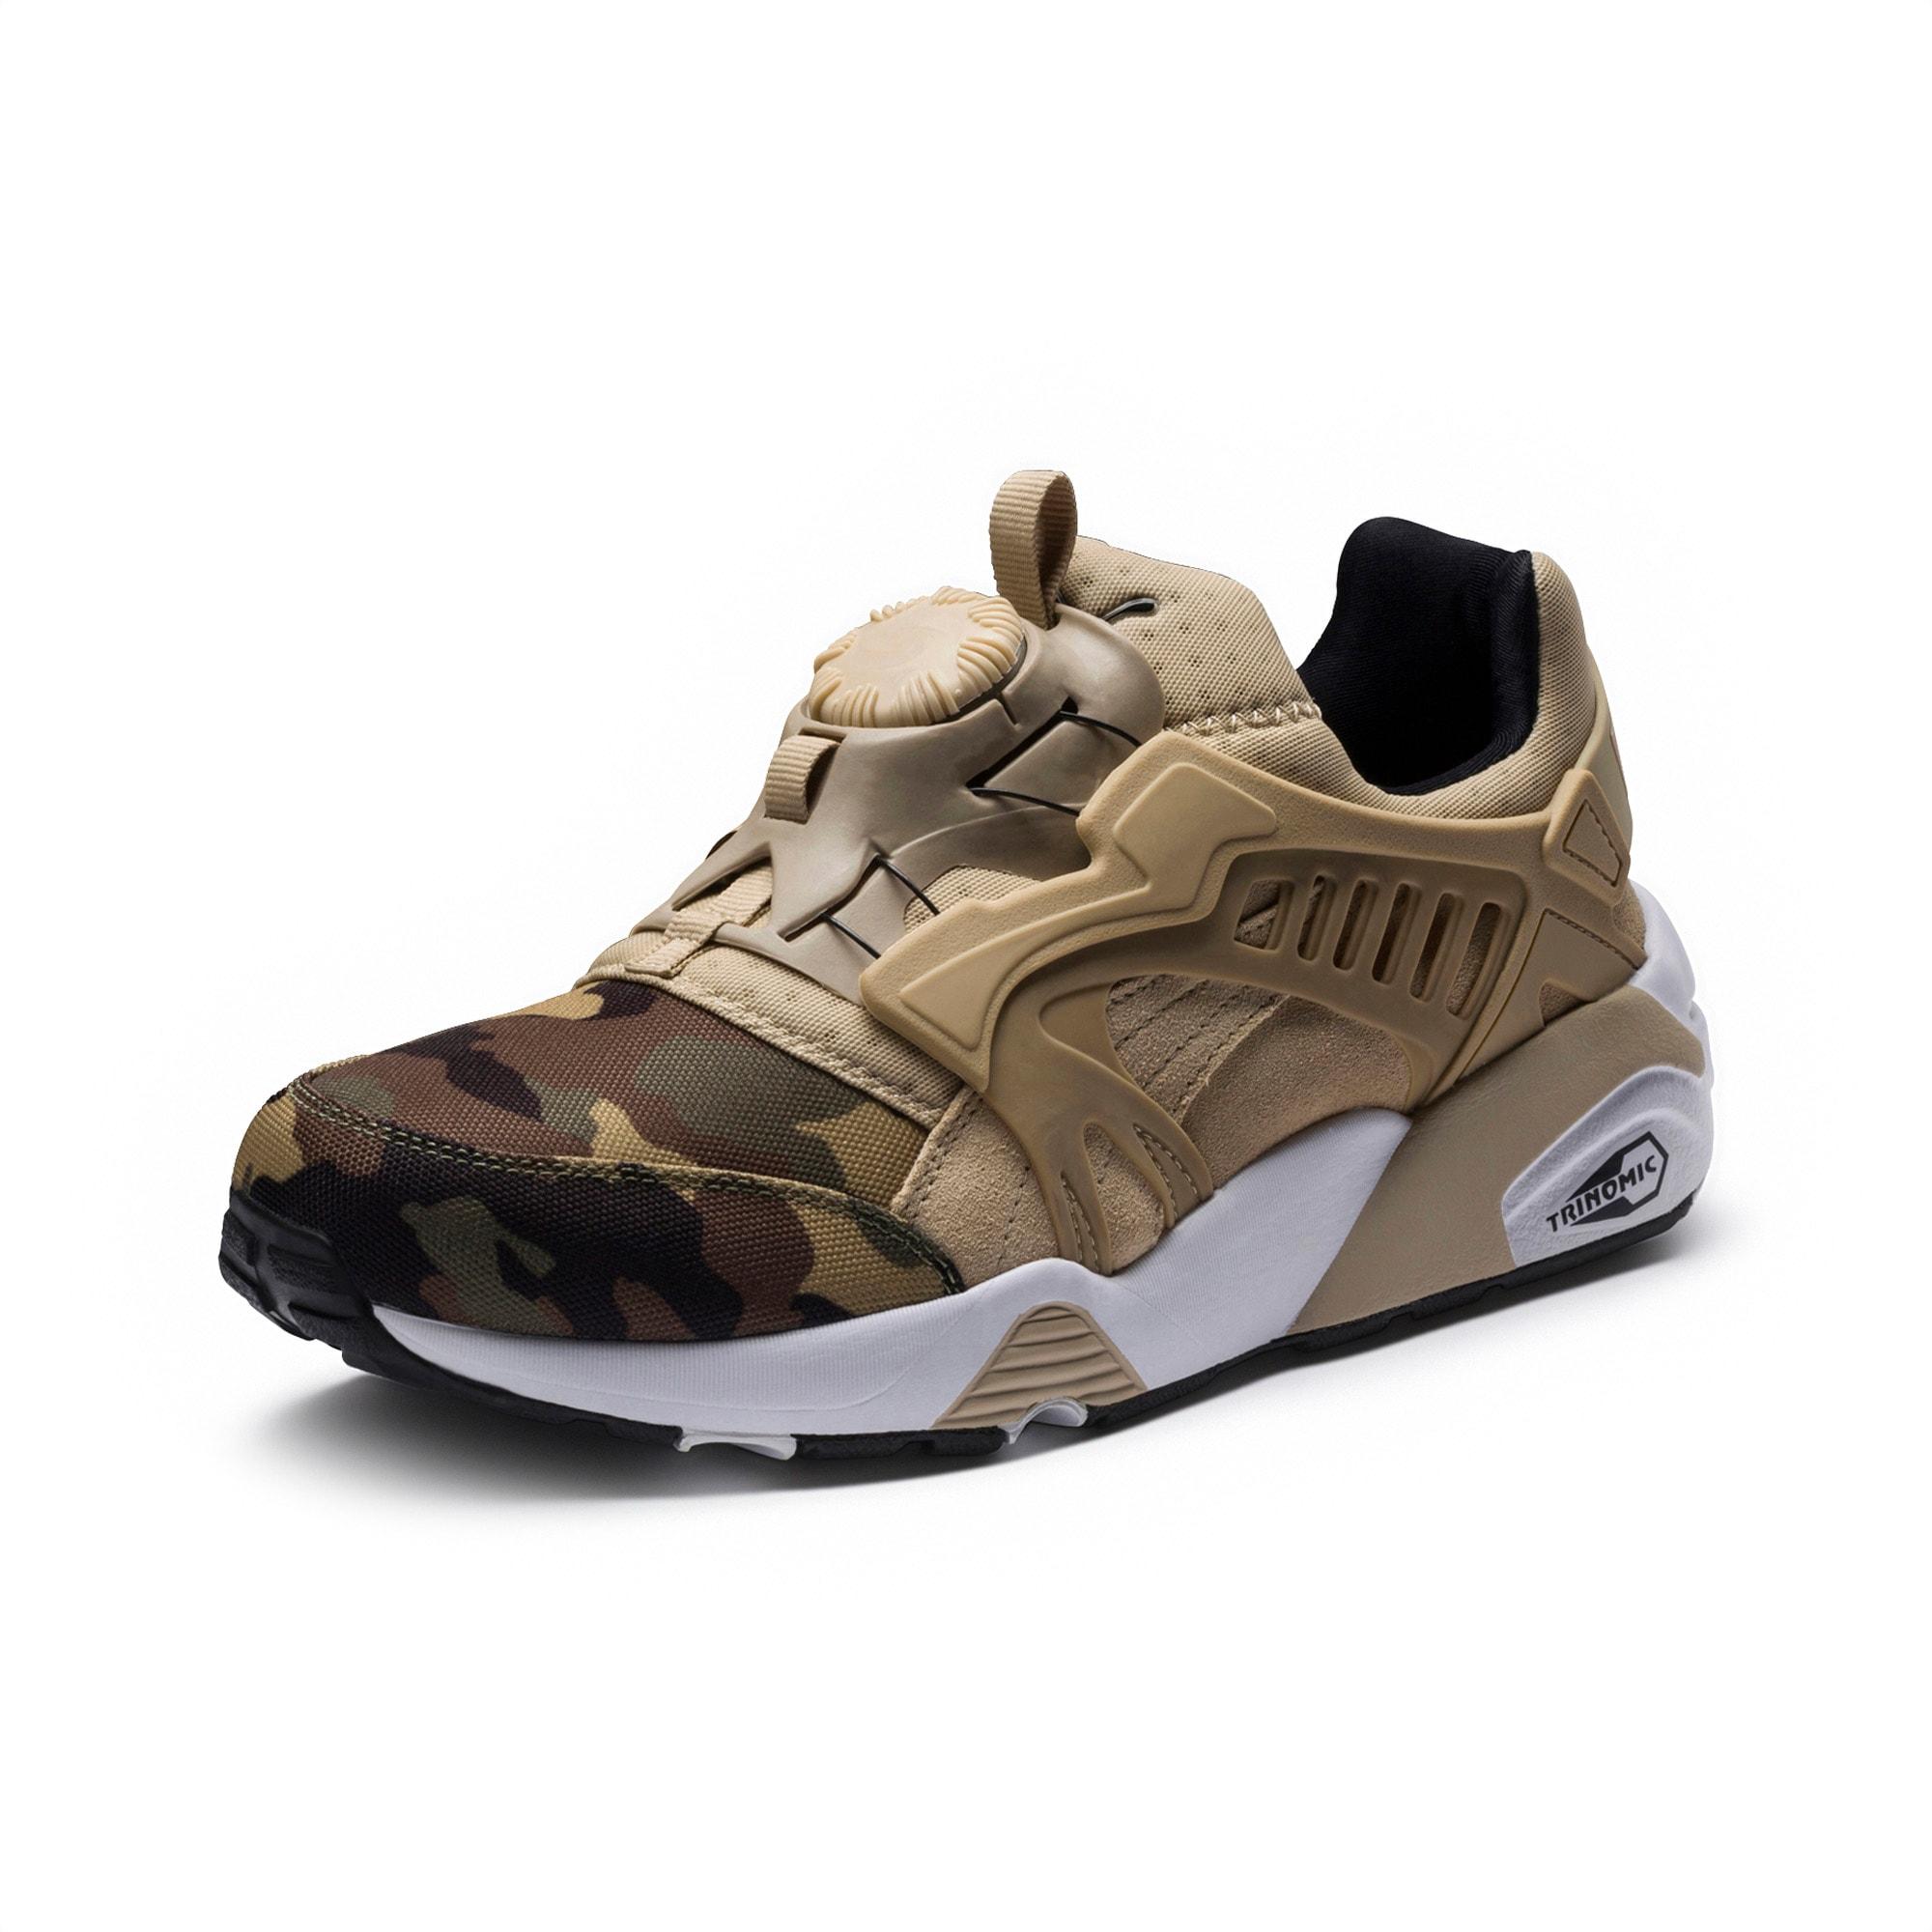 Befälhavare ytterligare Samråd  Disc Blaze Camo Sneakers   PUMA Low   PUMA